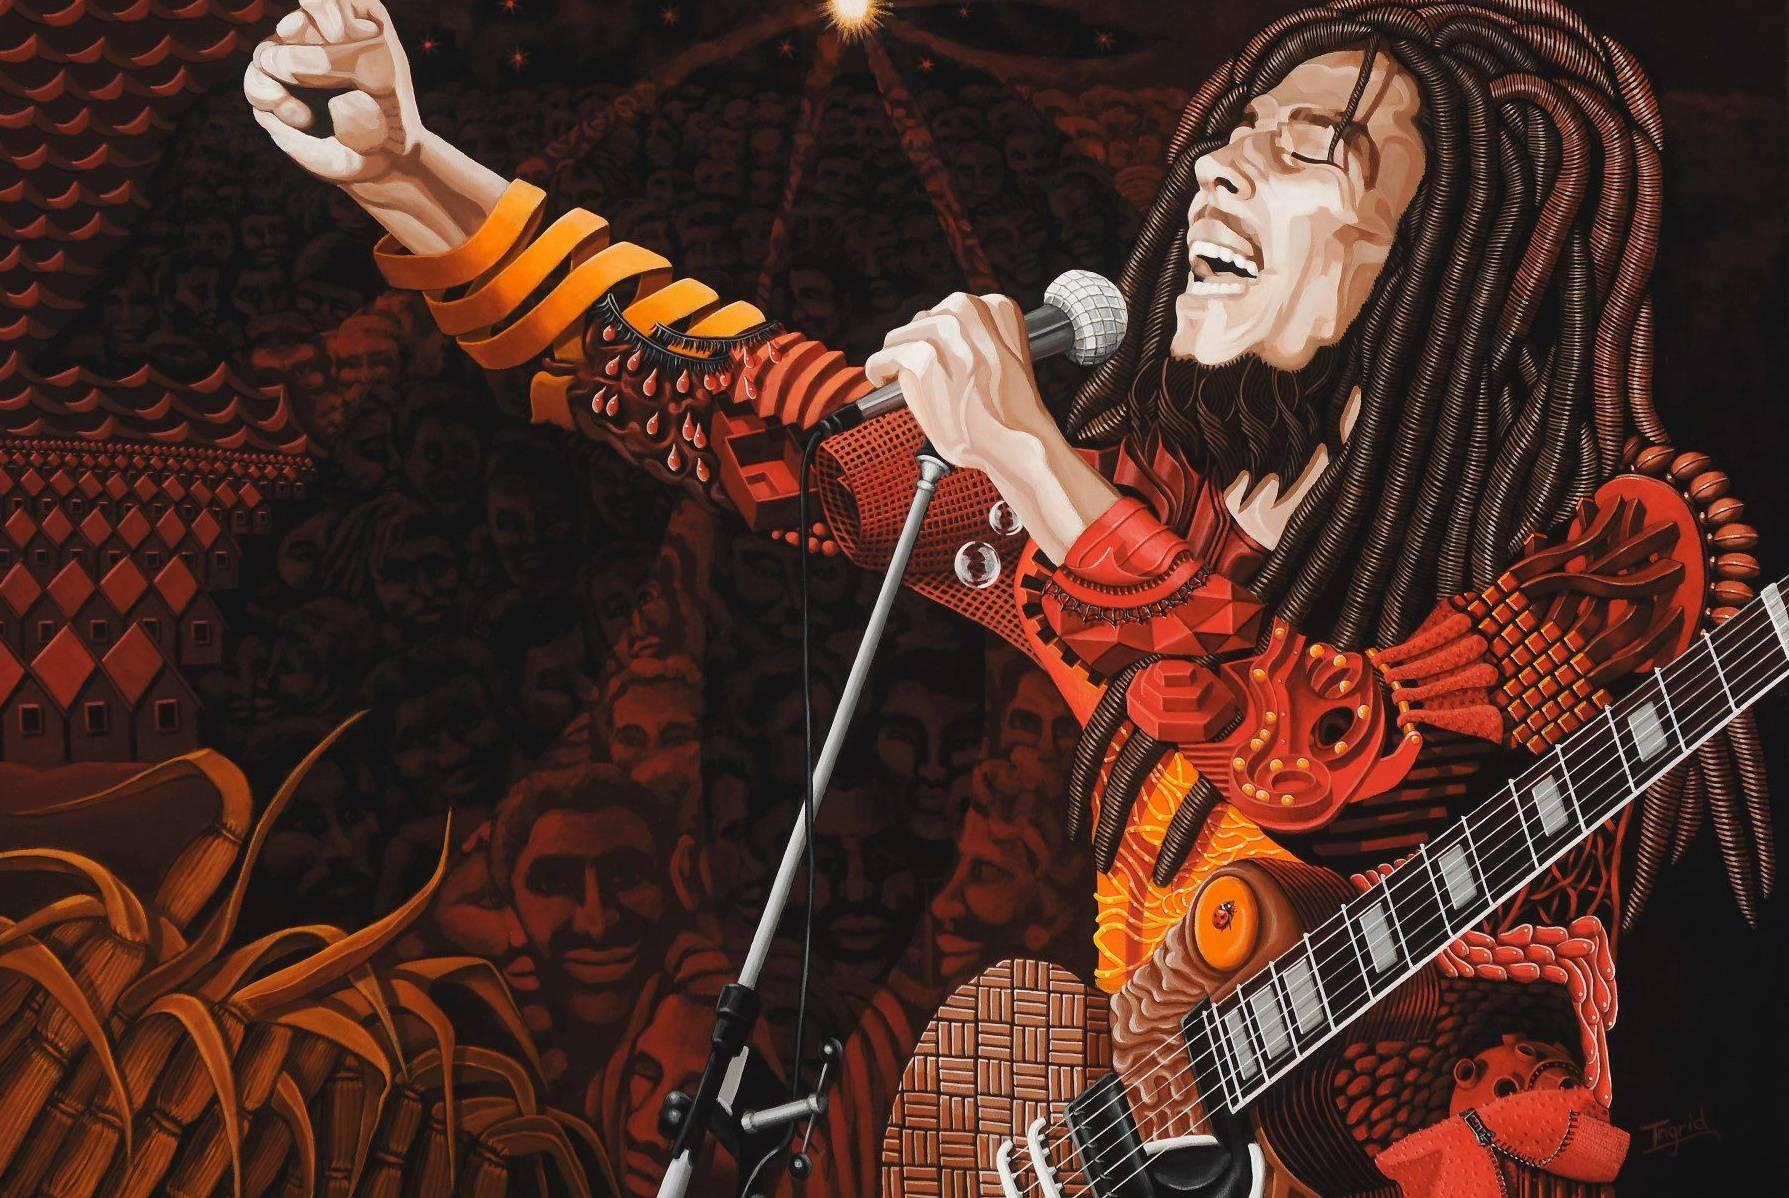 Legend Marley